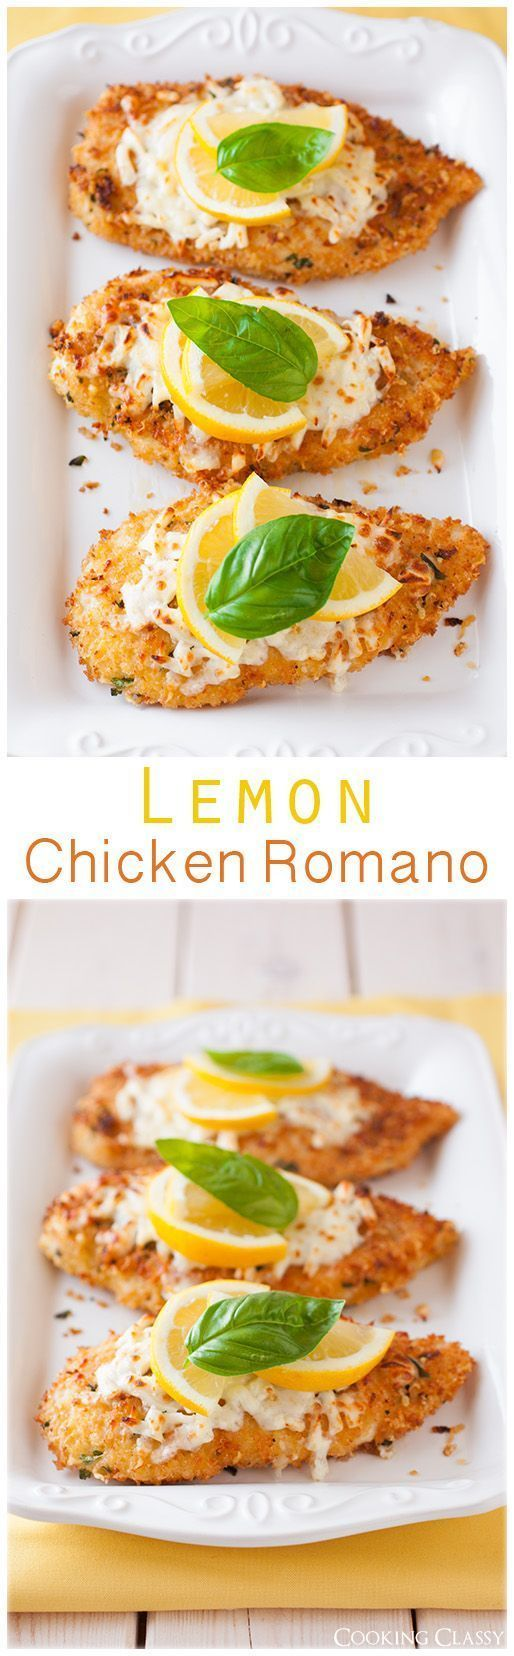 Lemon Chicken Romano : Cooking Classy